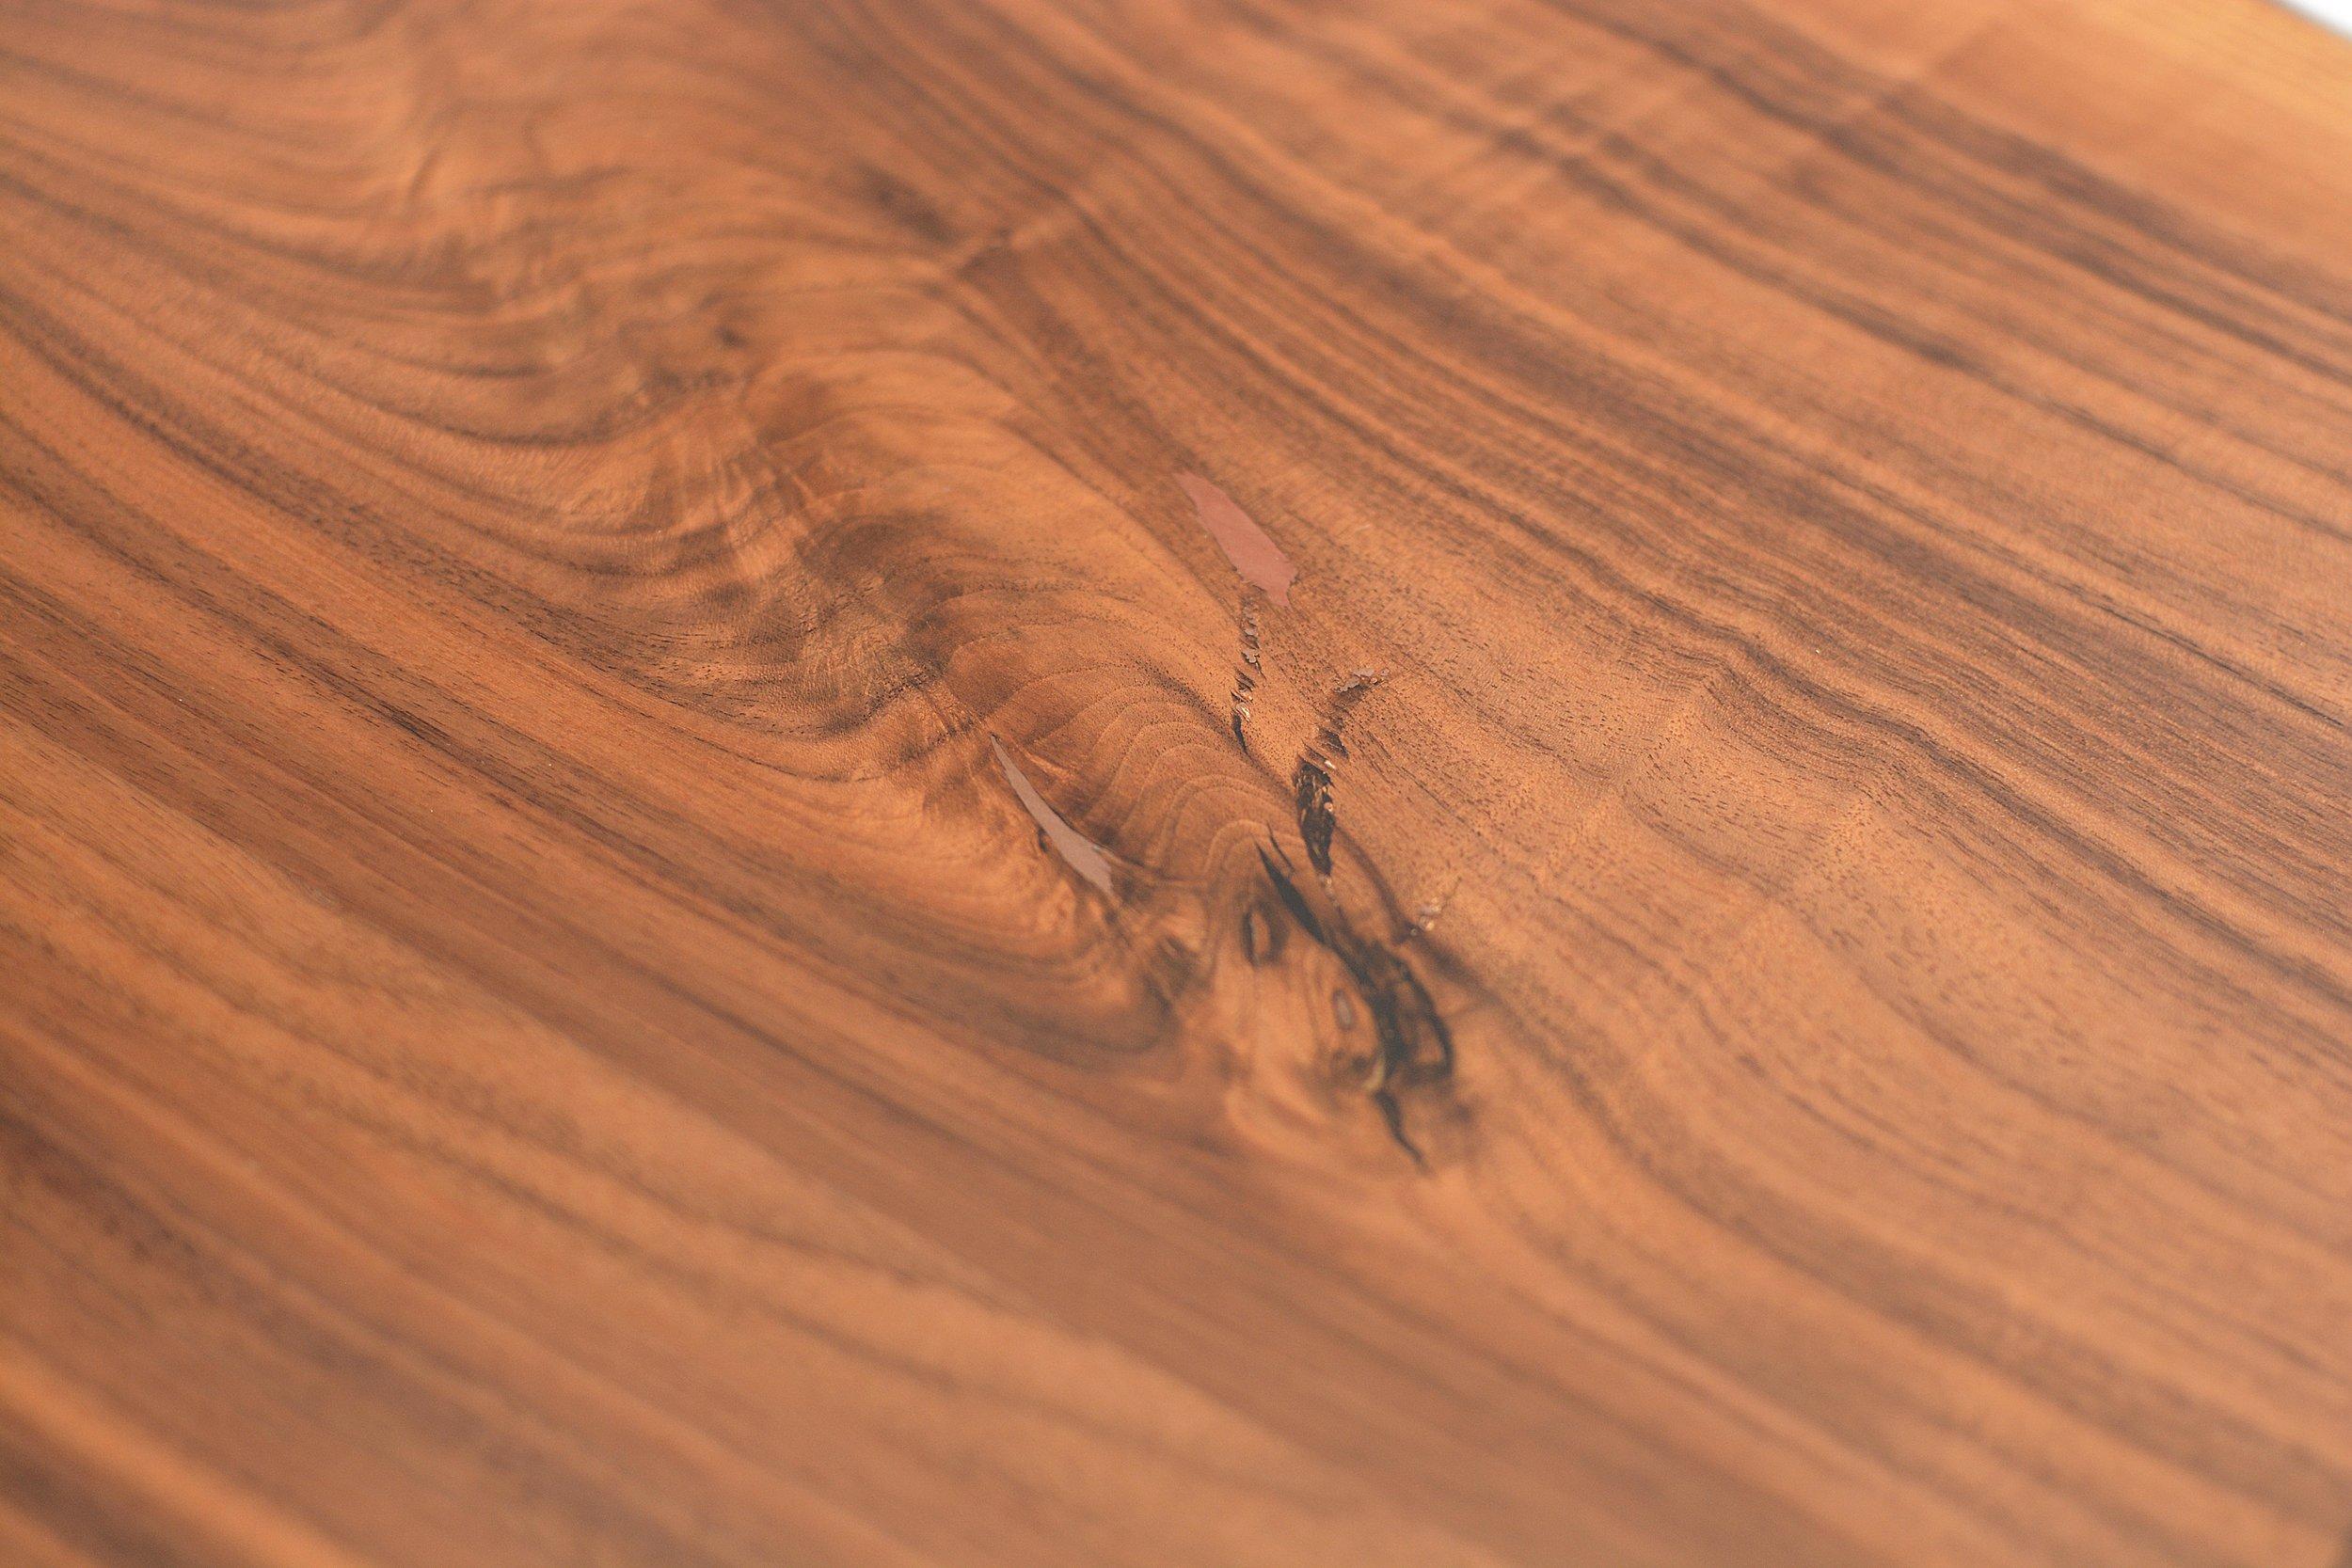 Etz & Steel Hermes Live Edge Walnut Table Close Up 14.JPG